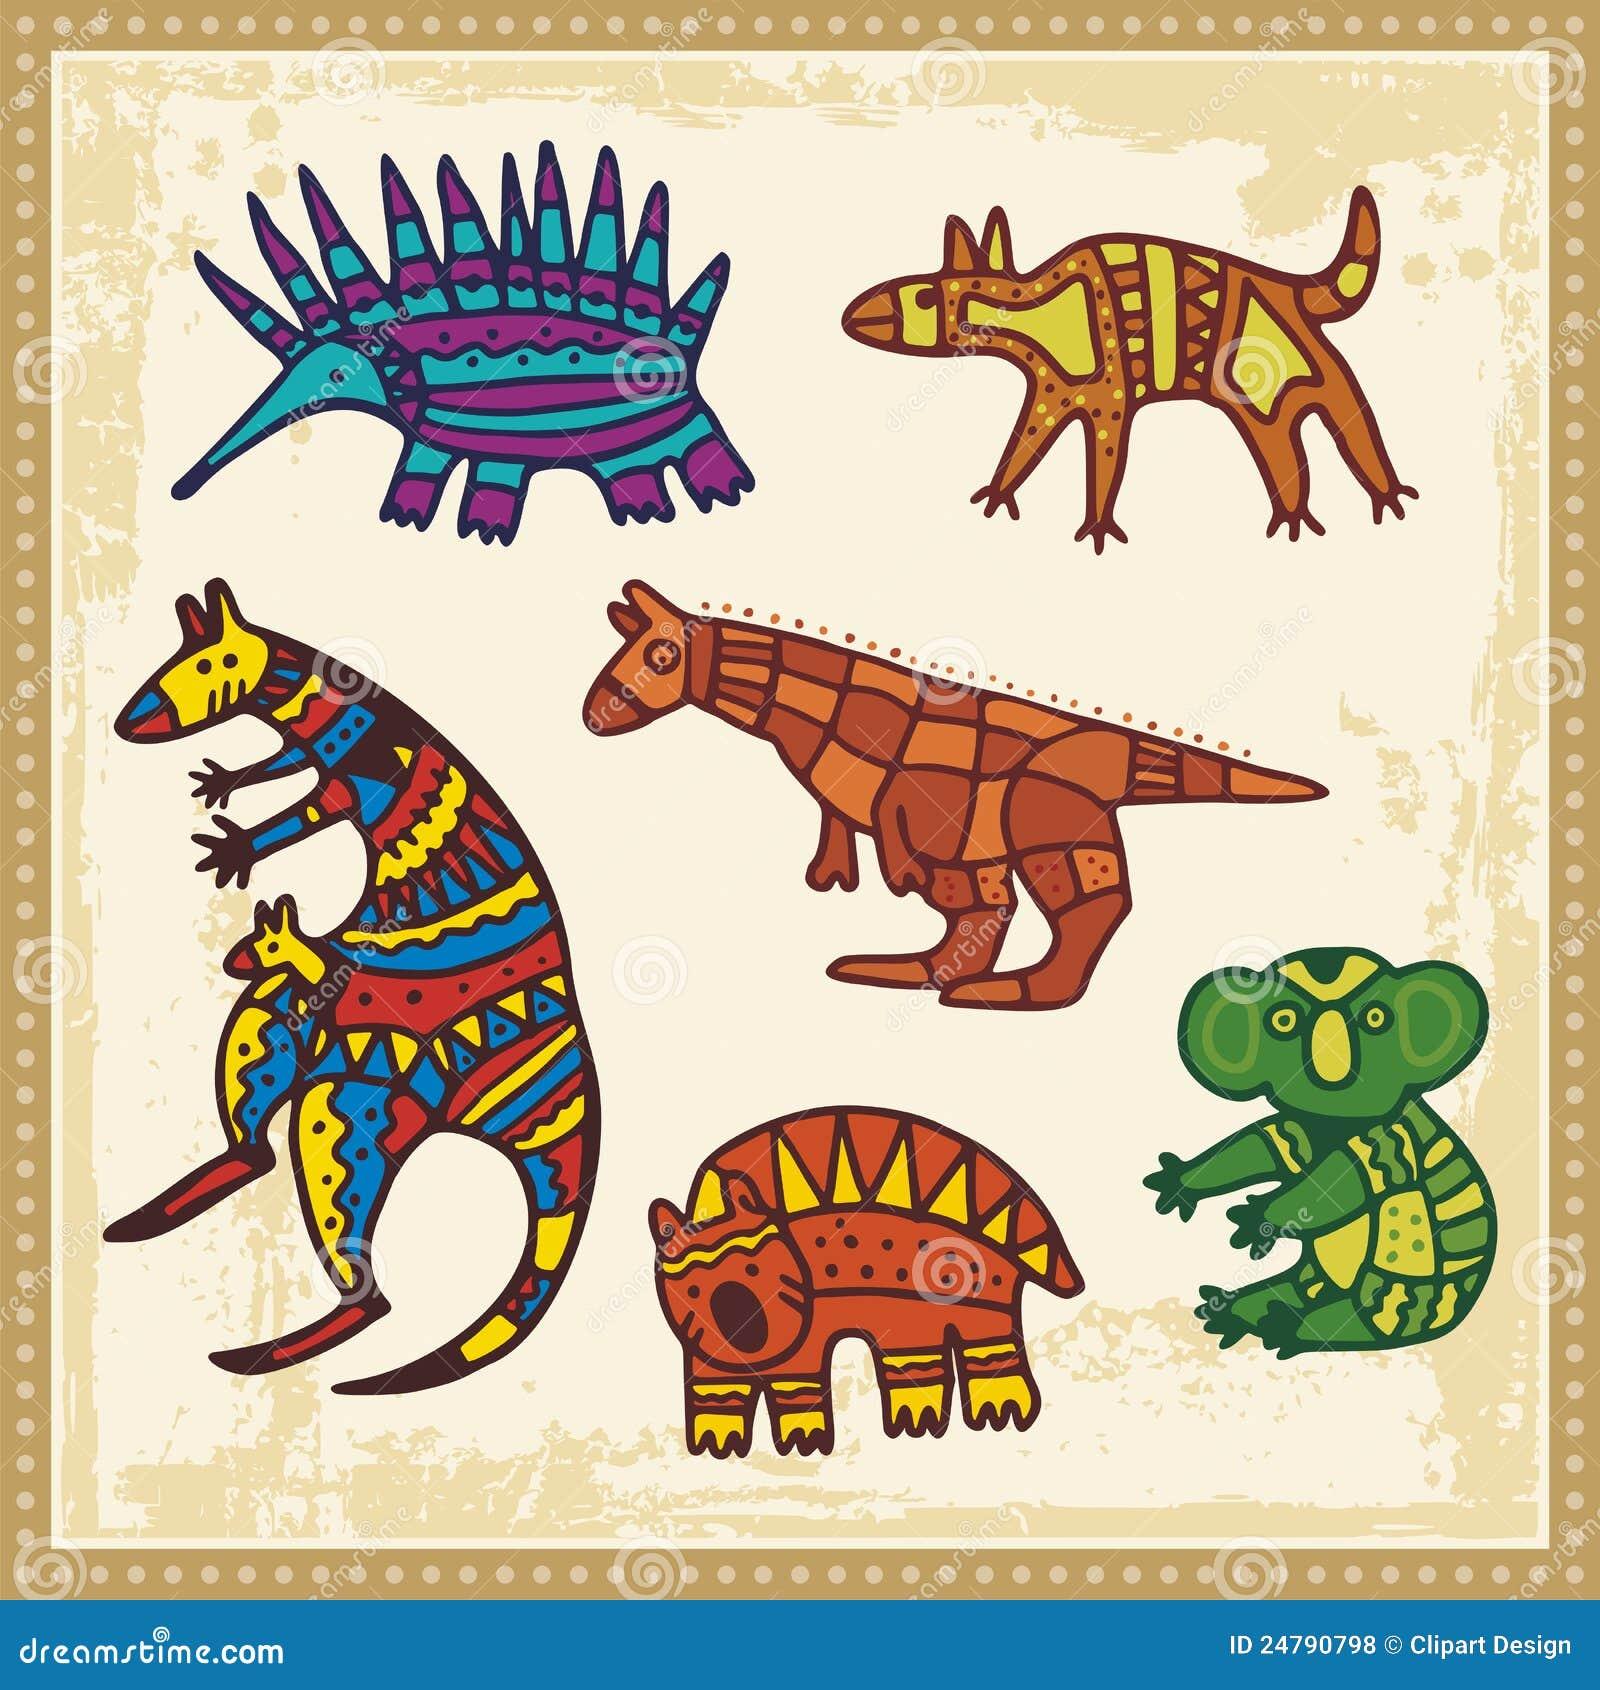 Animals In Australian Aboriginal Style Royalty Free Stock Photos ...